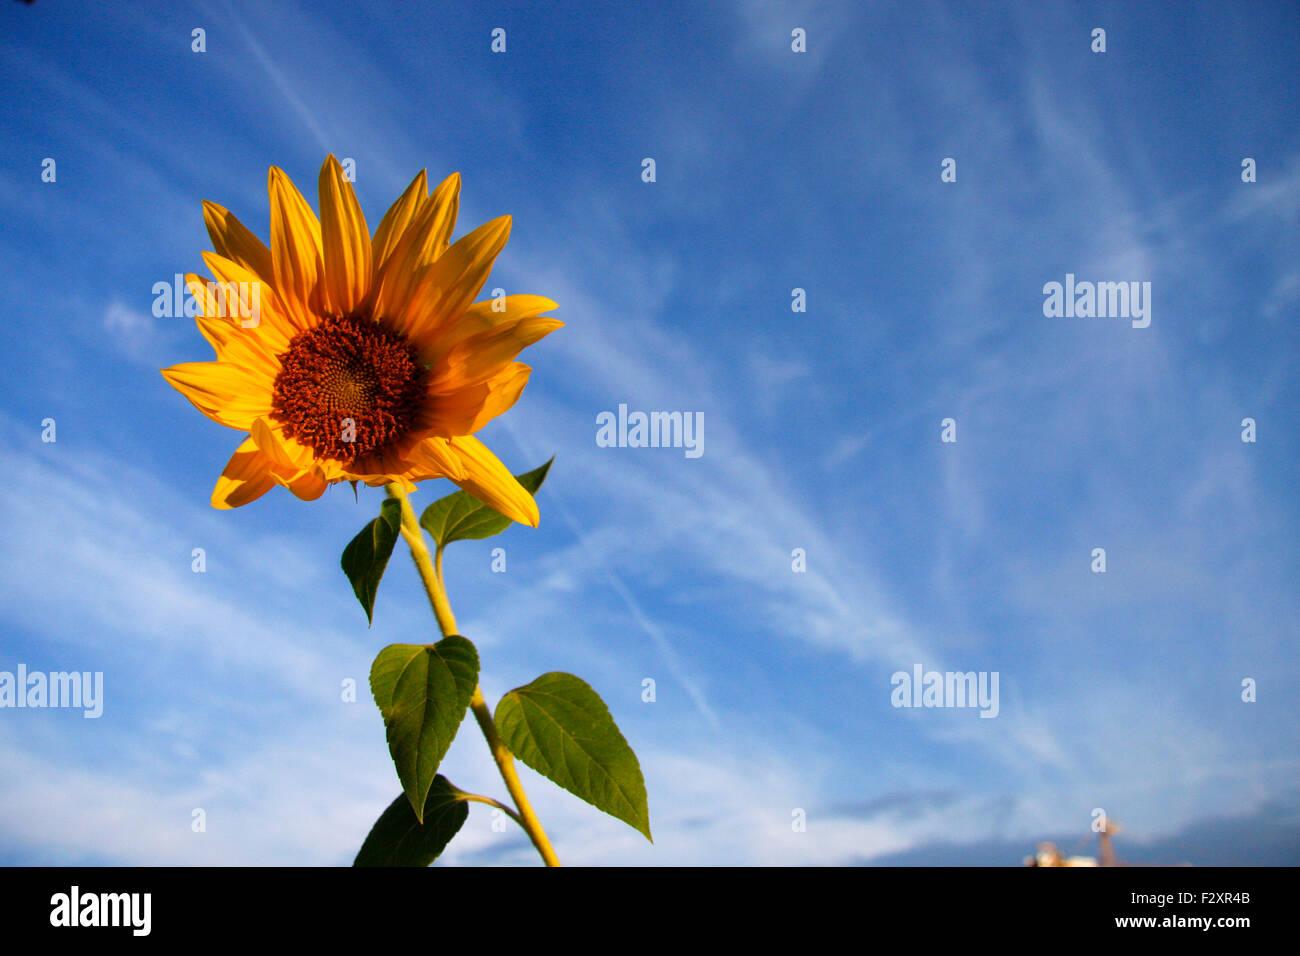 Sonnenblume. - Stock Image